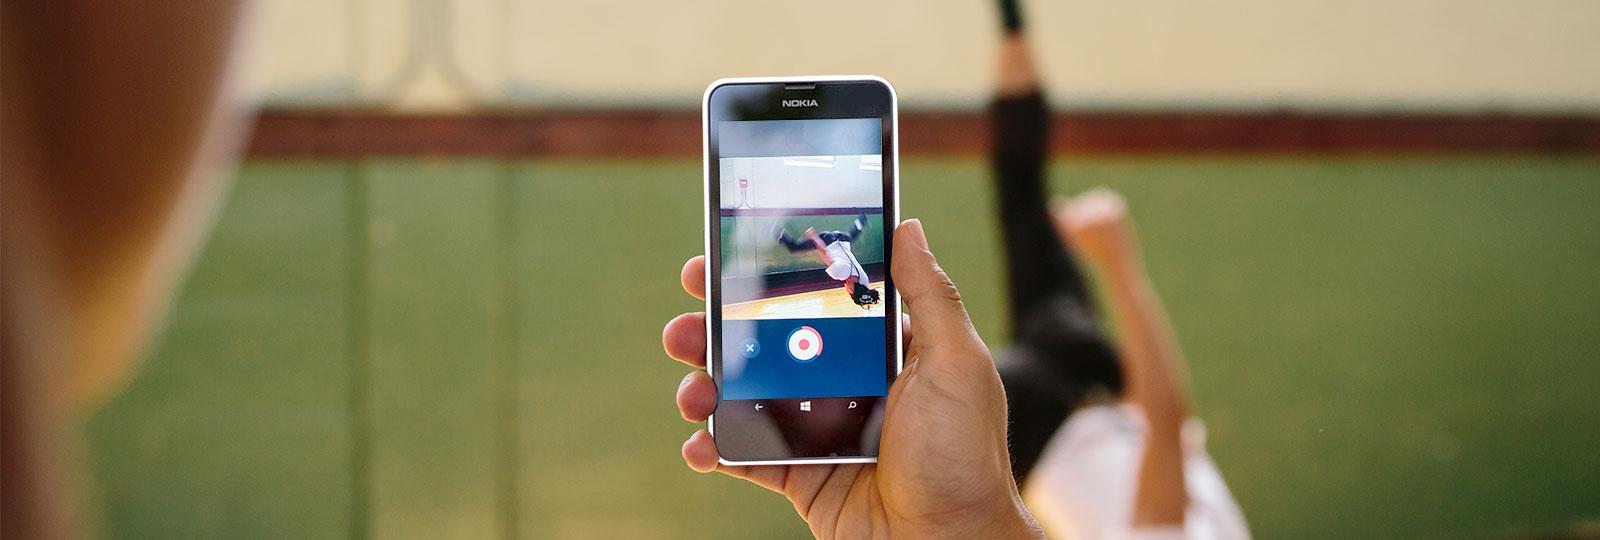 Download Skype Qik for video messaging.